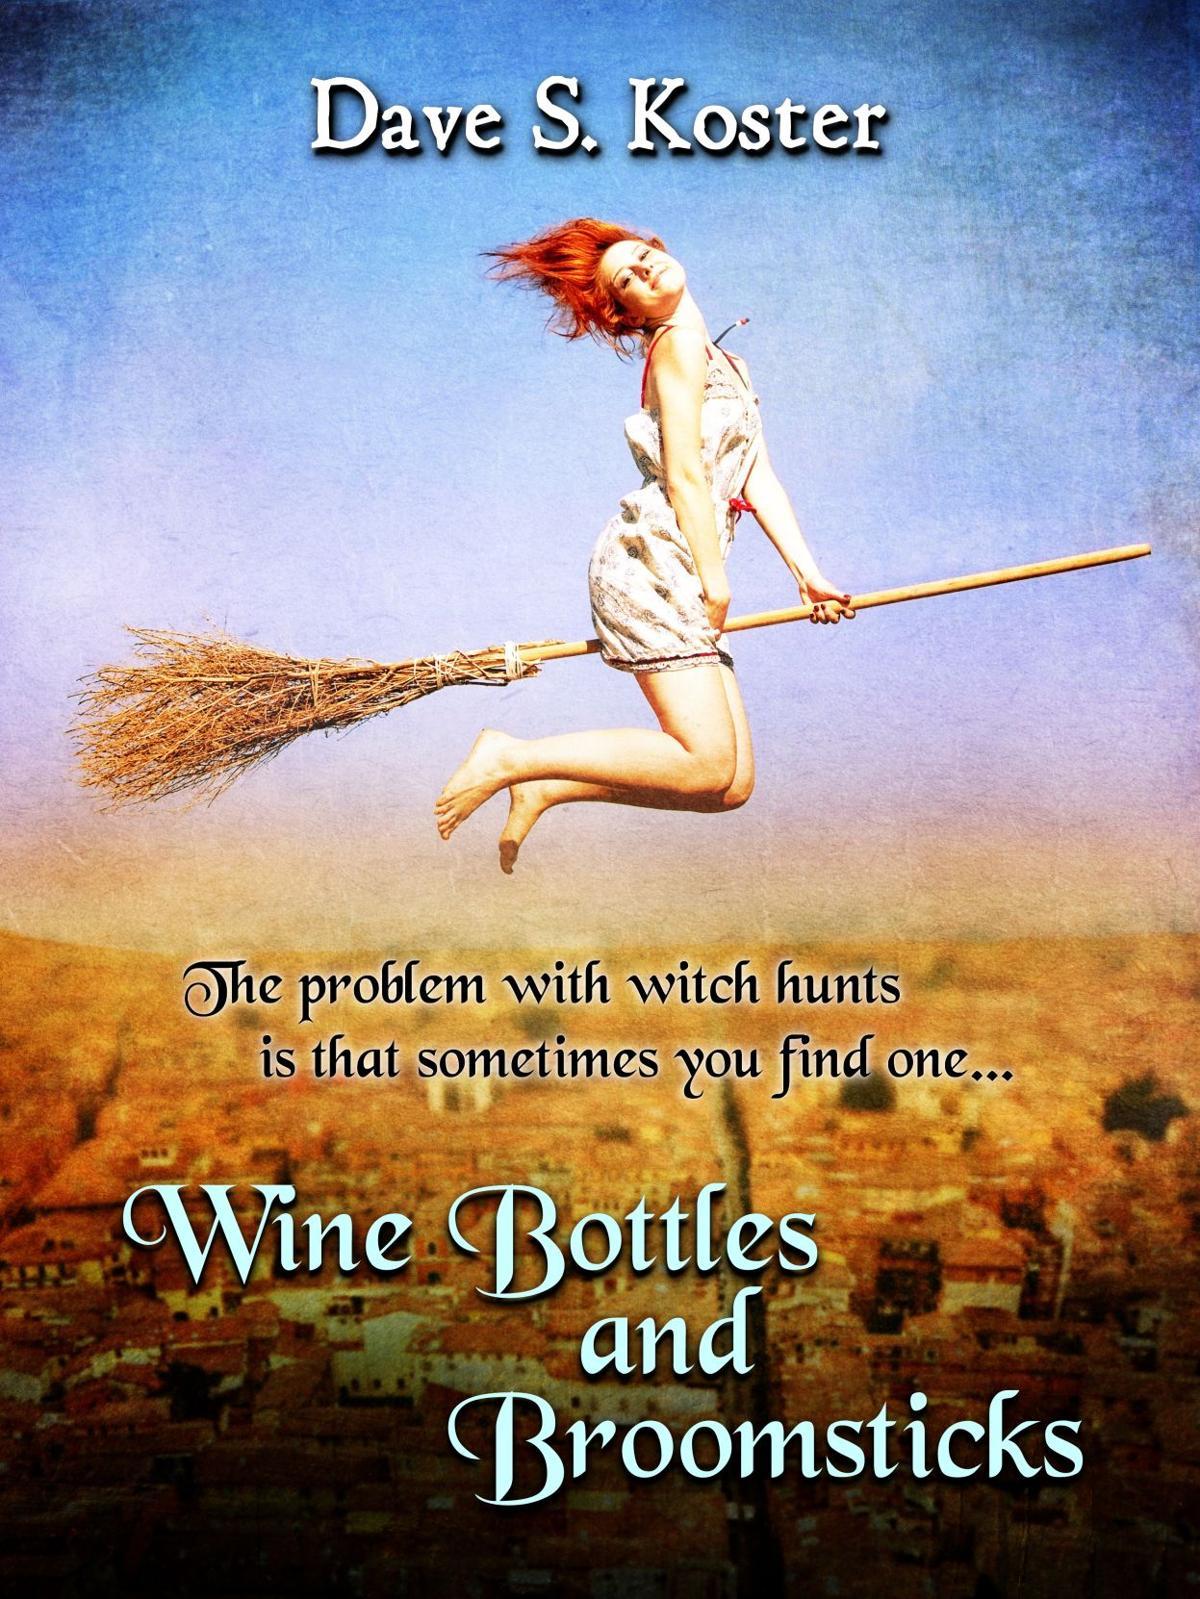 Wine Bottles and Broomsticks